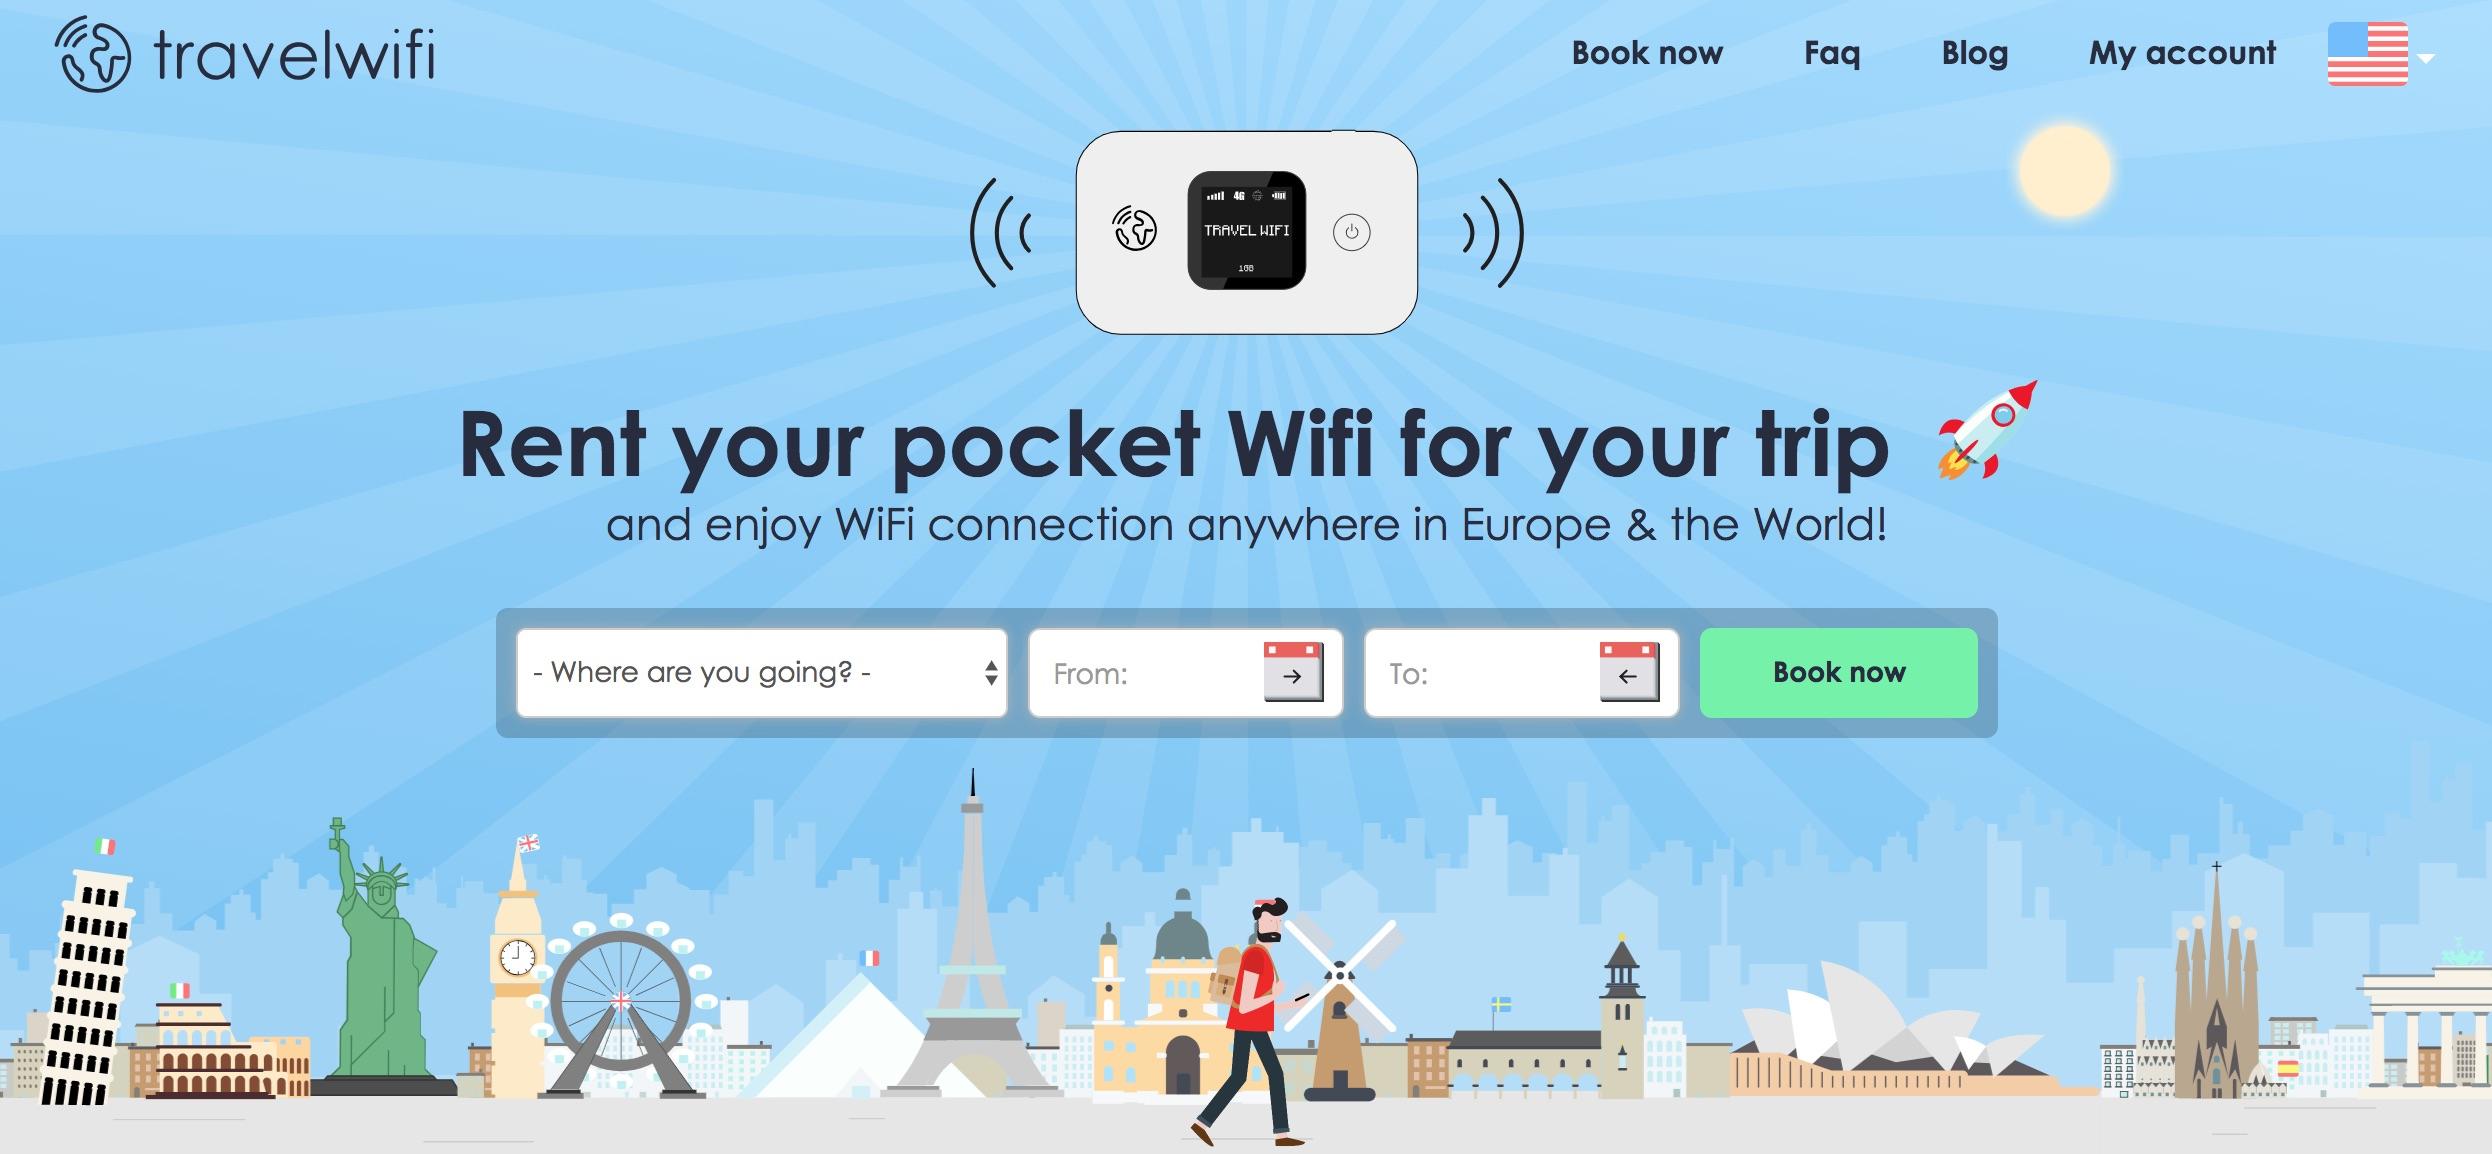 Travel wifi, premium pocket wifi rentals in Europe!